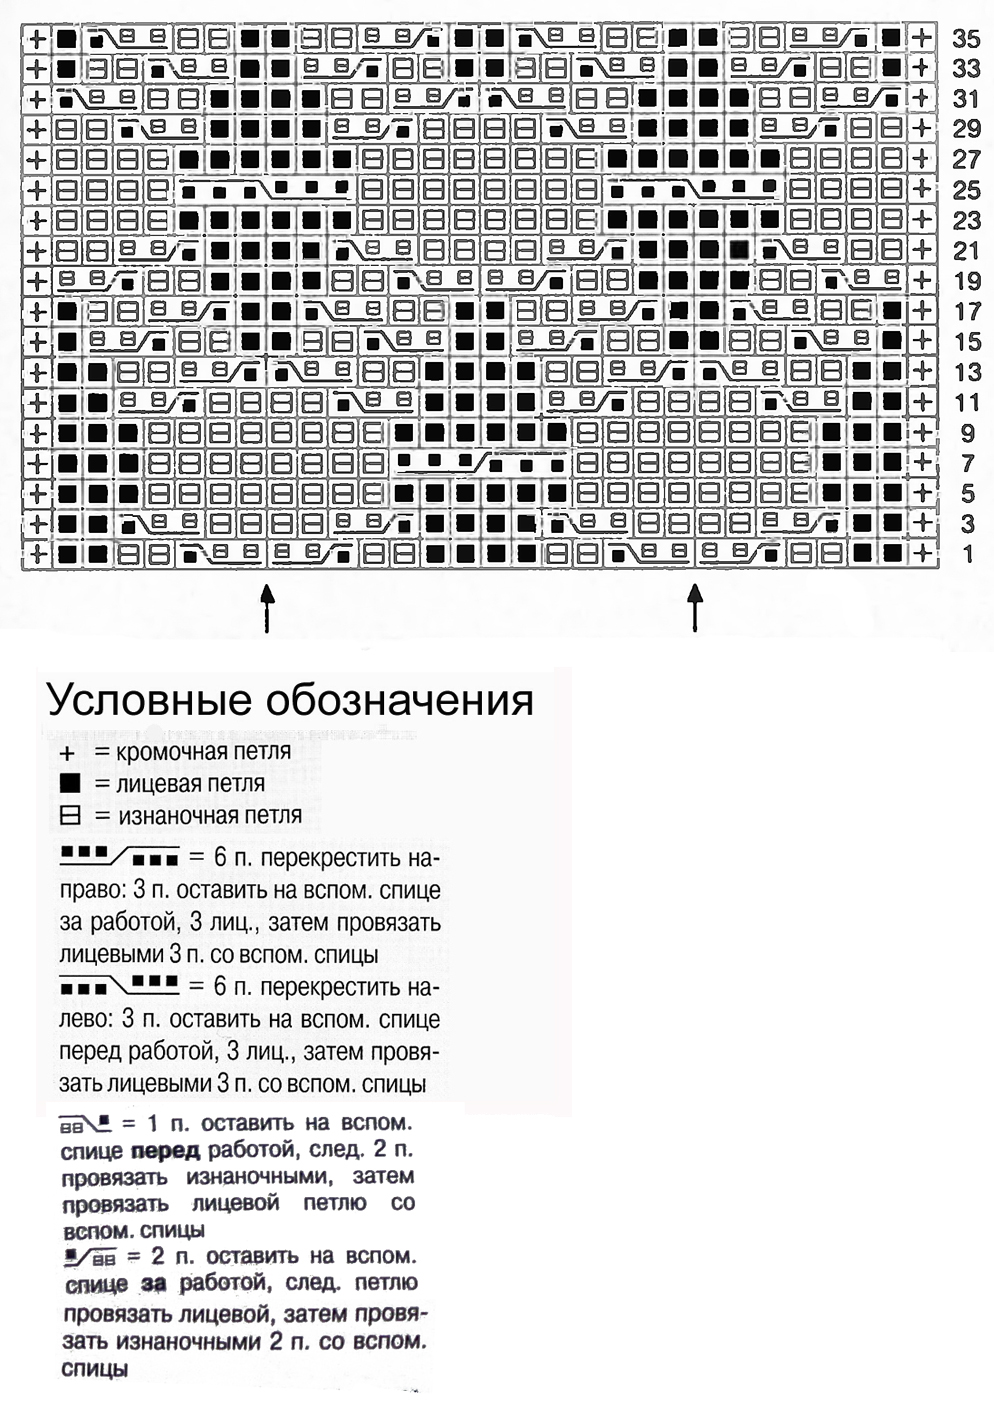 Вязание спицами схема узора имитация кос 75